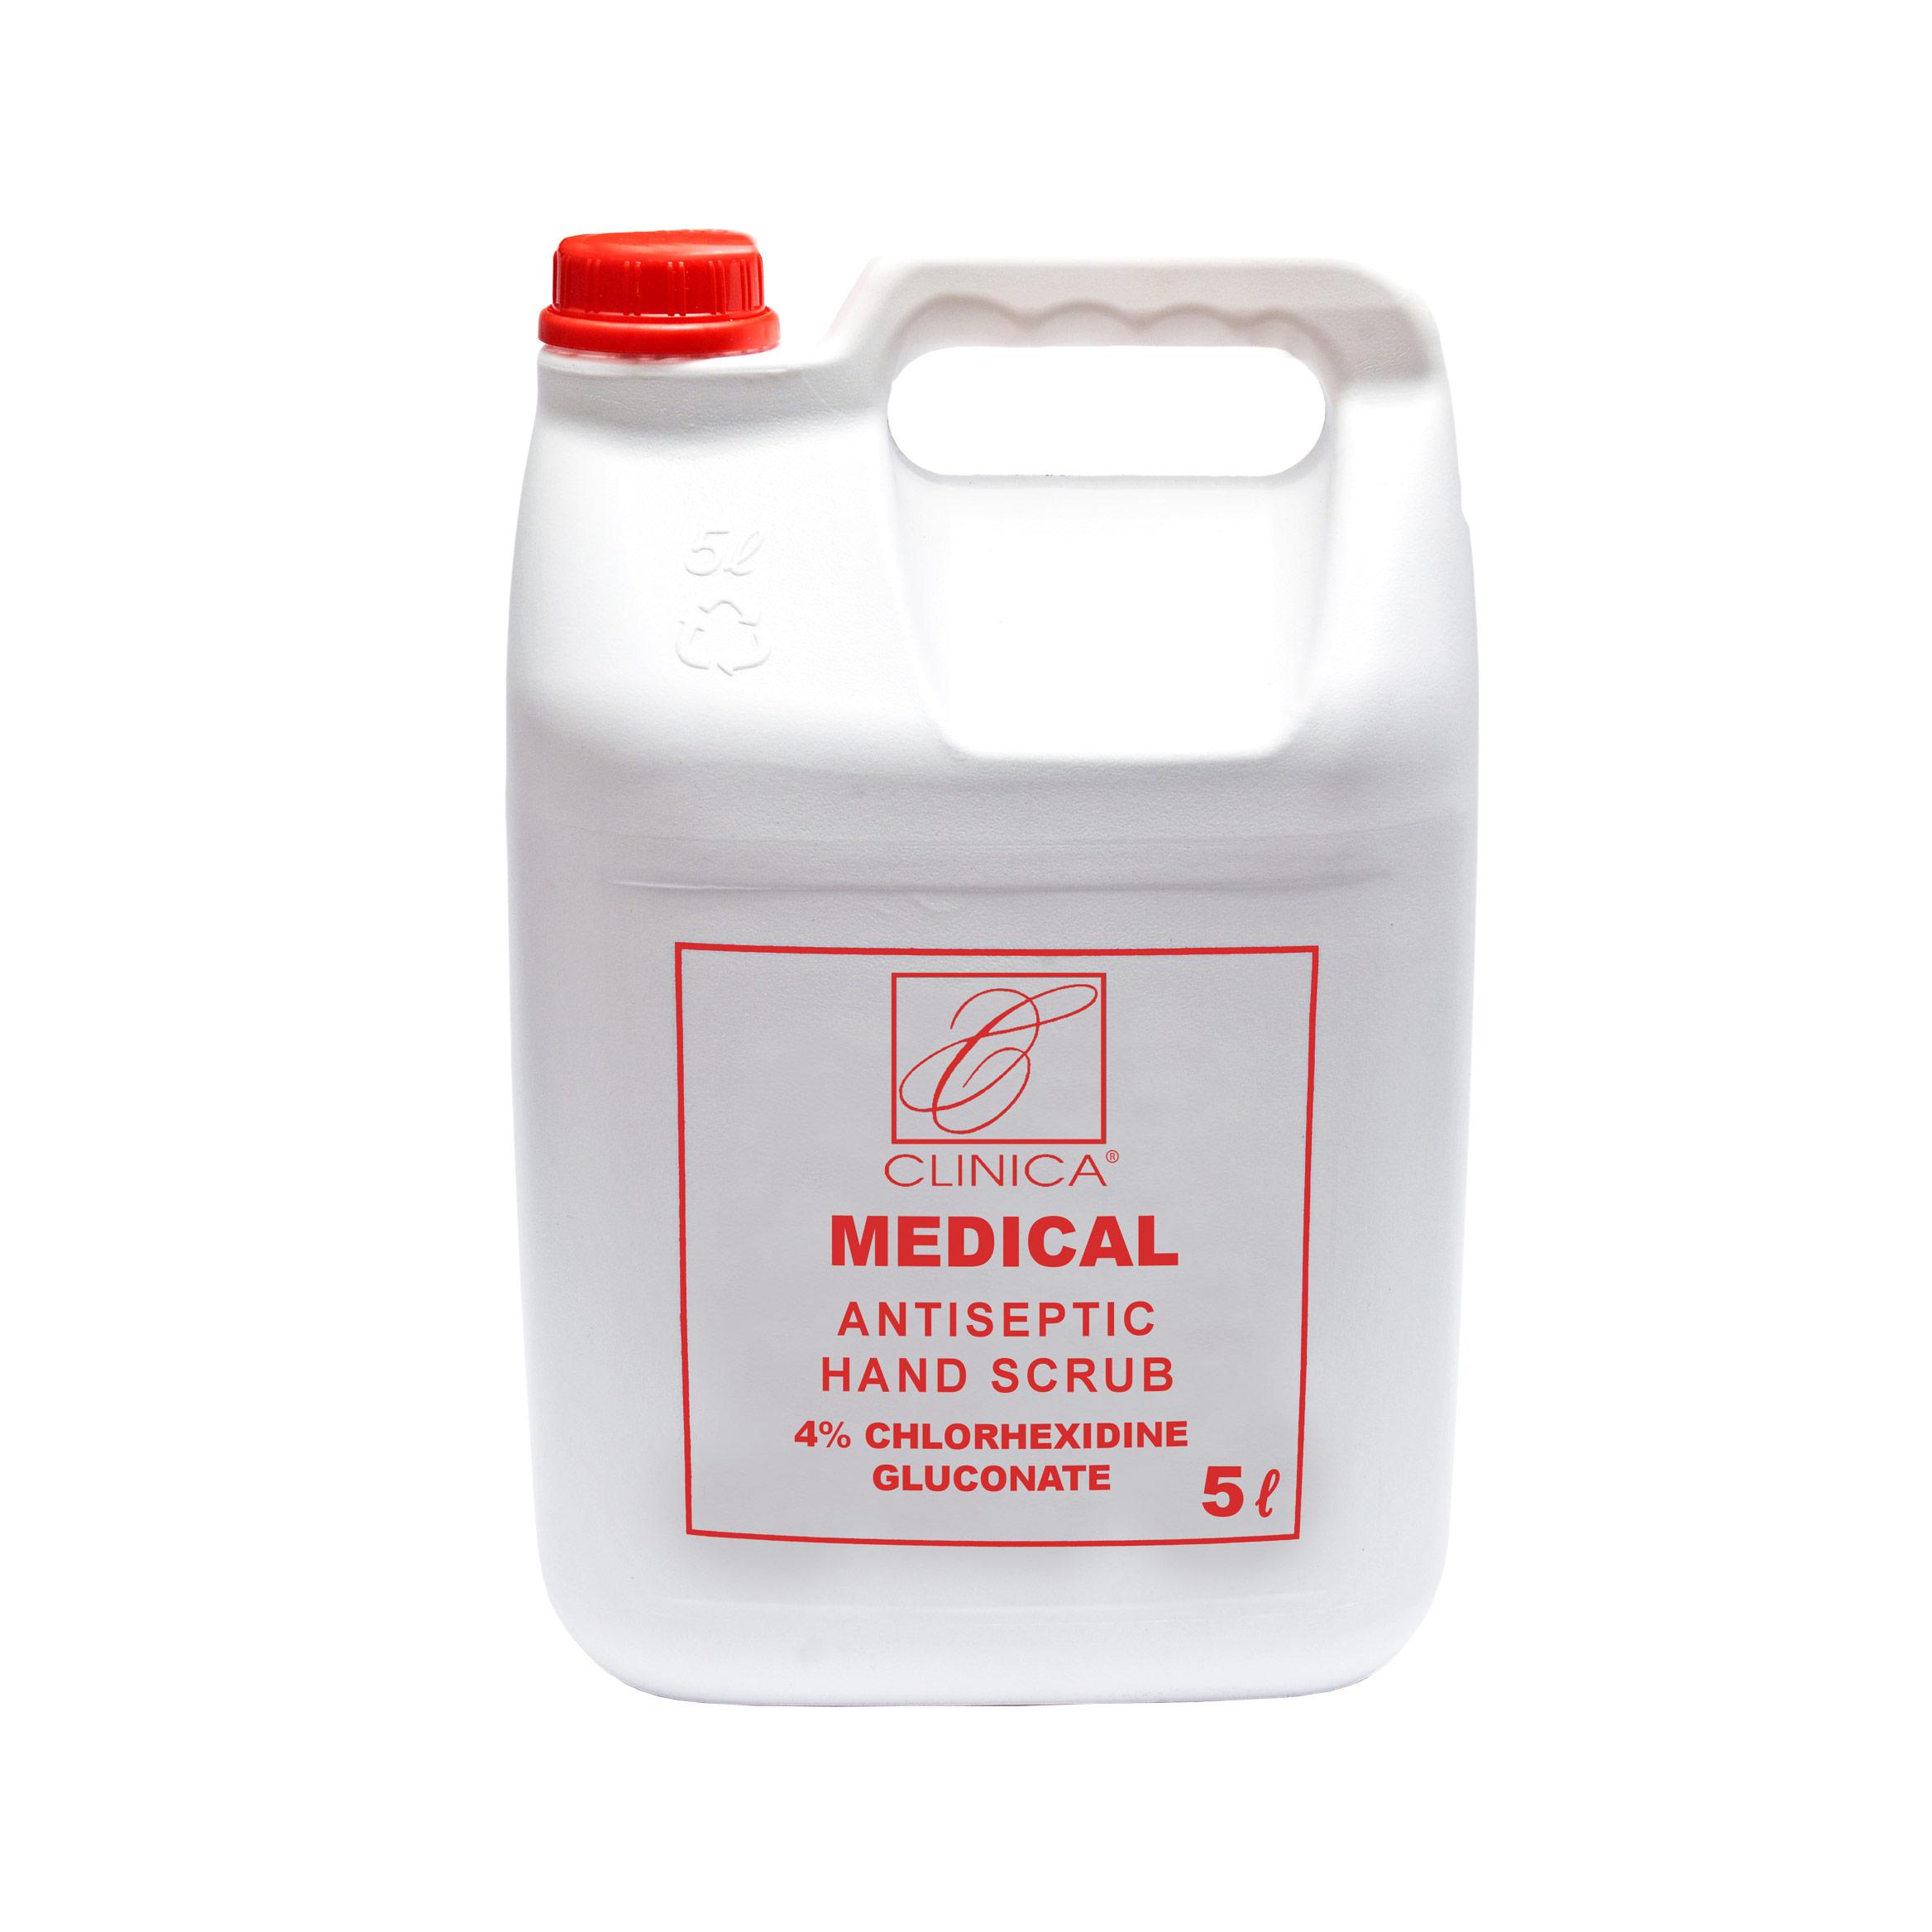 Clinica Medical Hand Scrub - 5 Litre